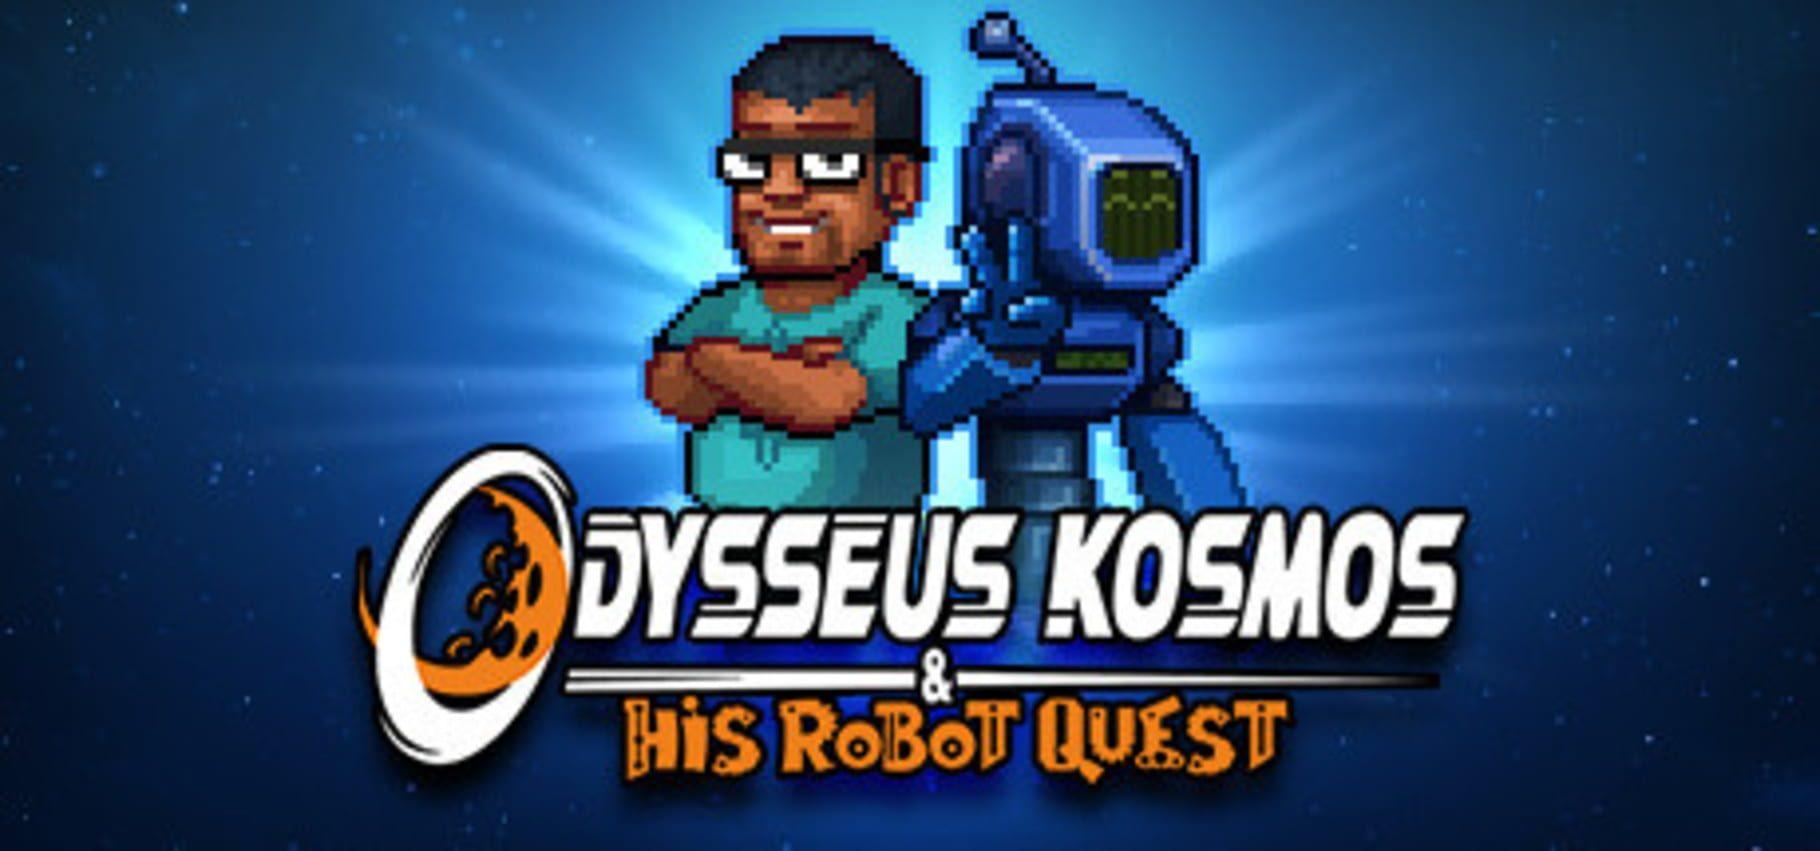 buy Odysseus Kosmos and his Robot Quest cd key for all platform